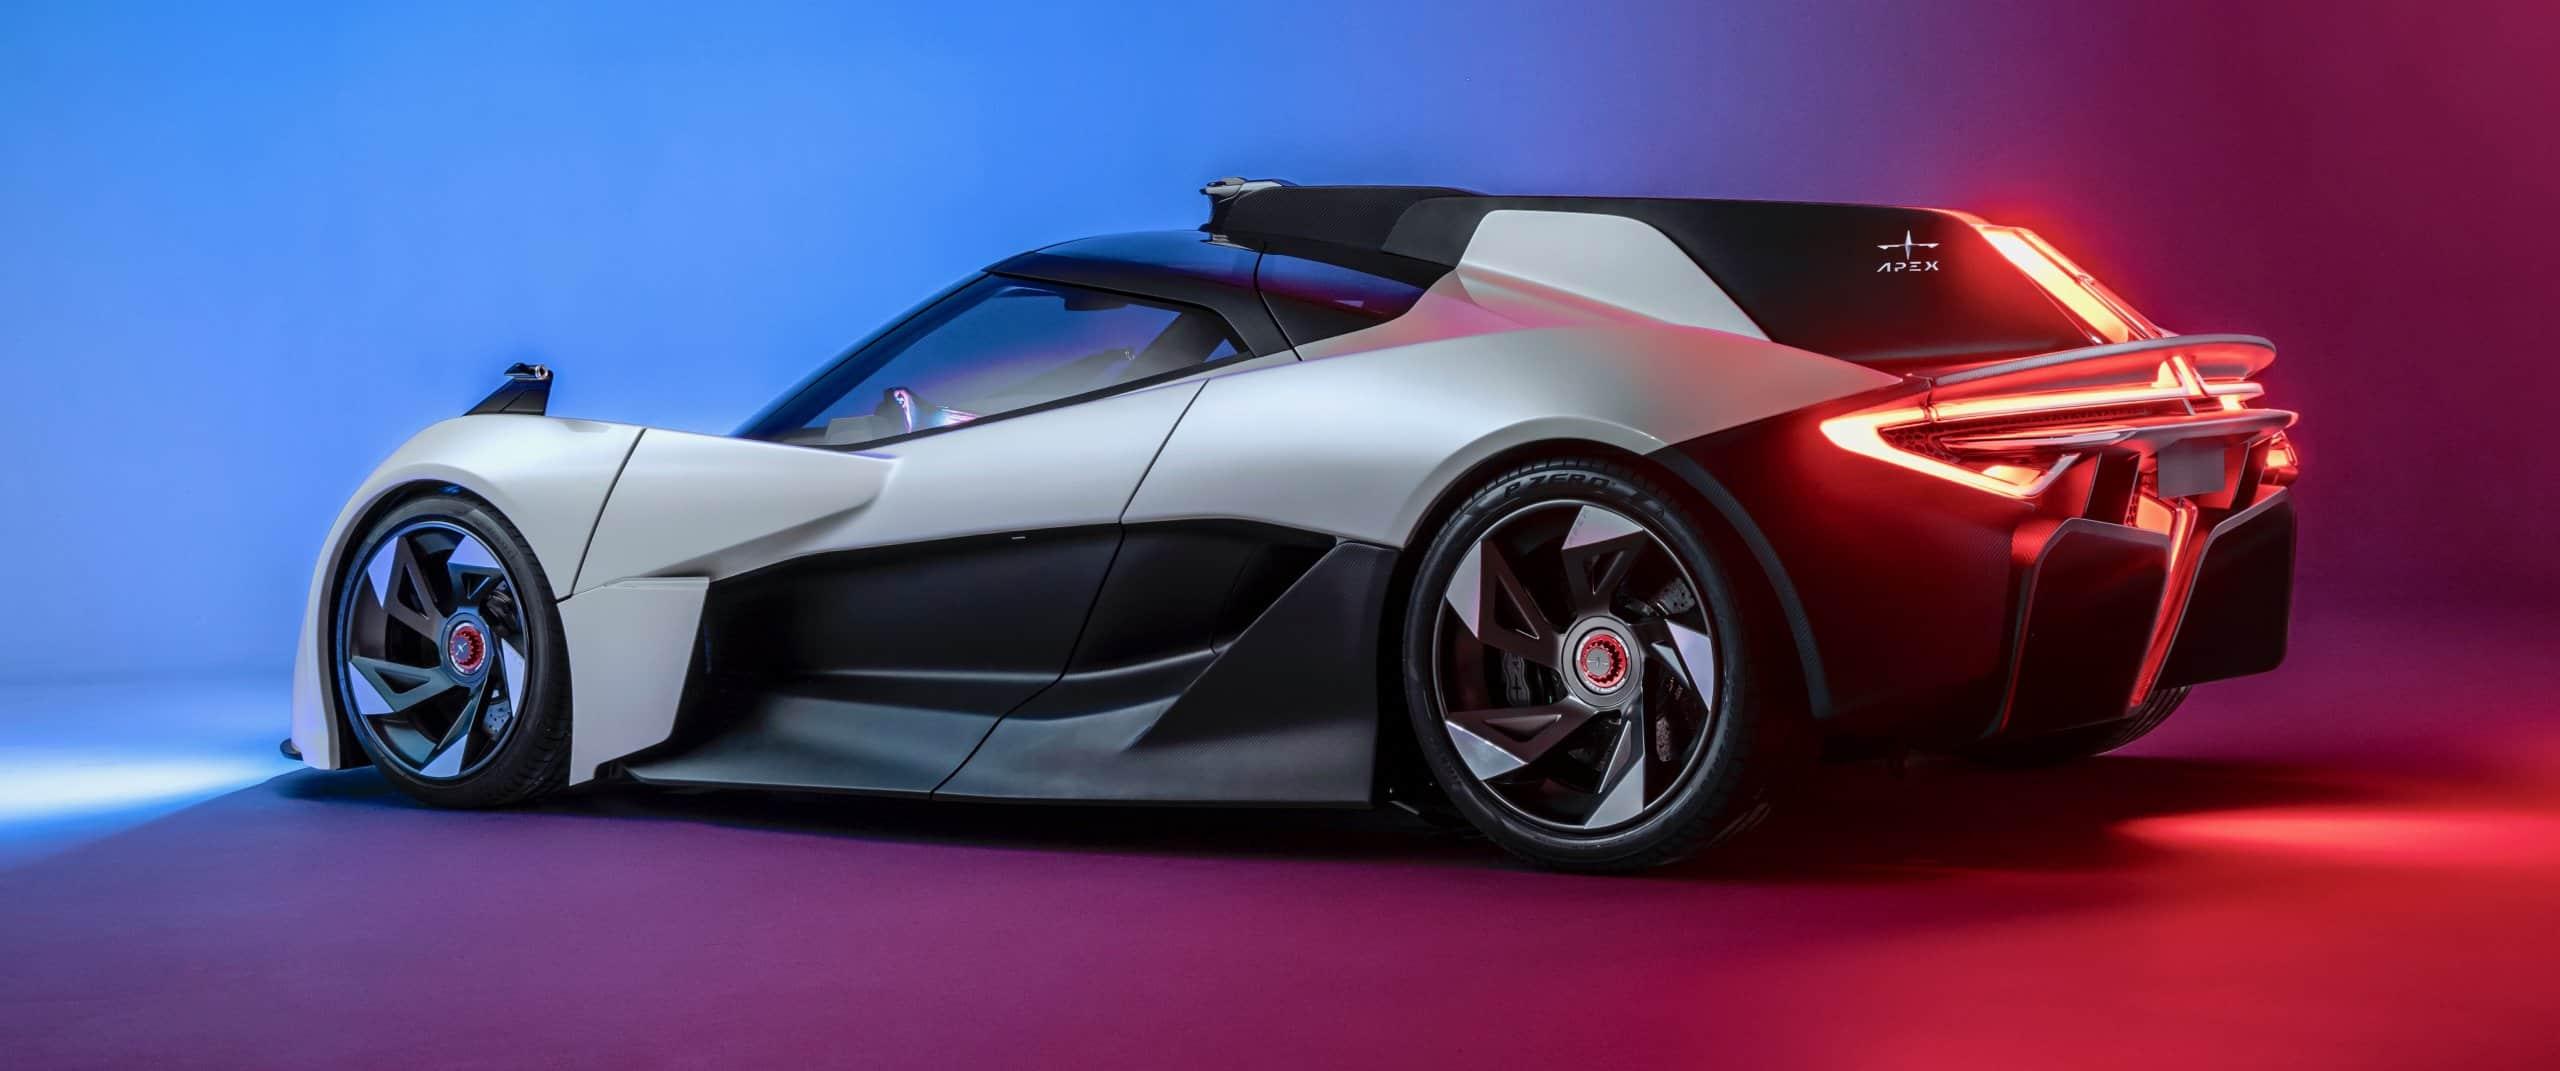 Apex, Apex unveils its electric-powered sports car, ClassicCars.com Journal